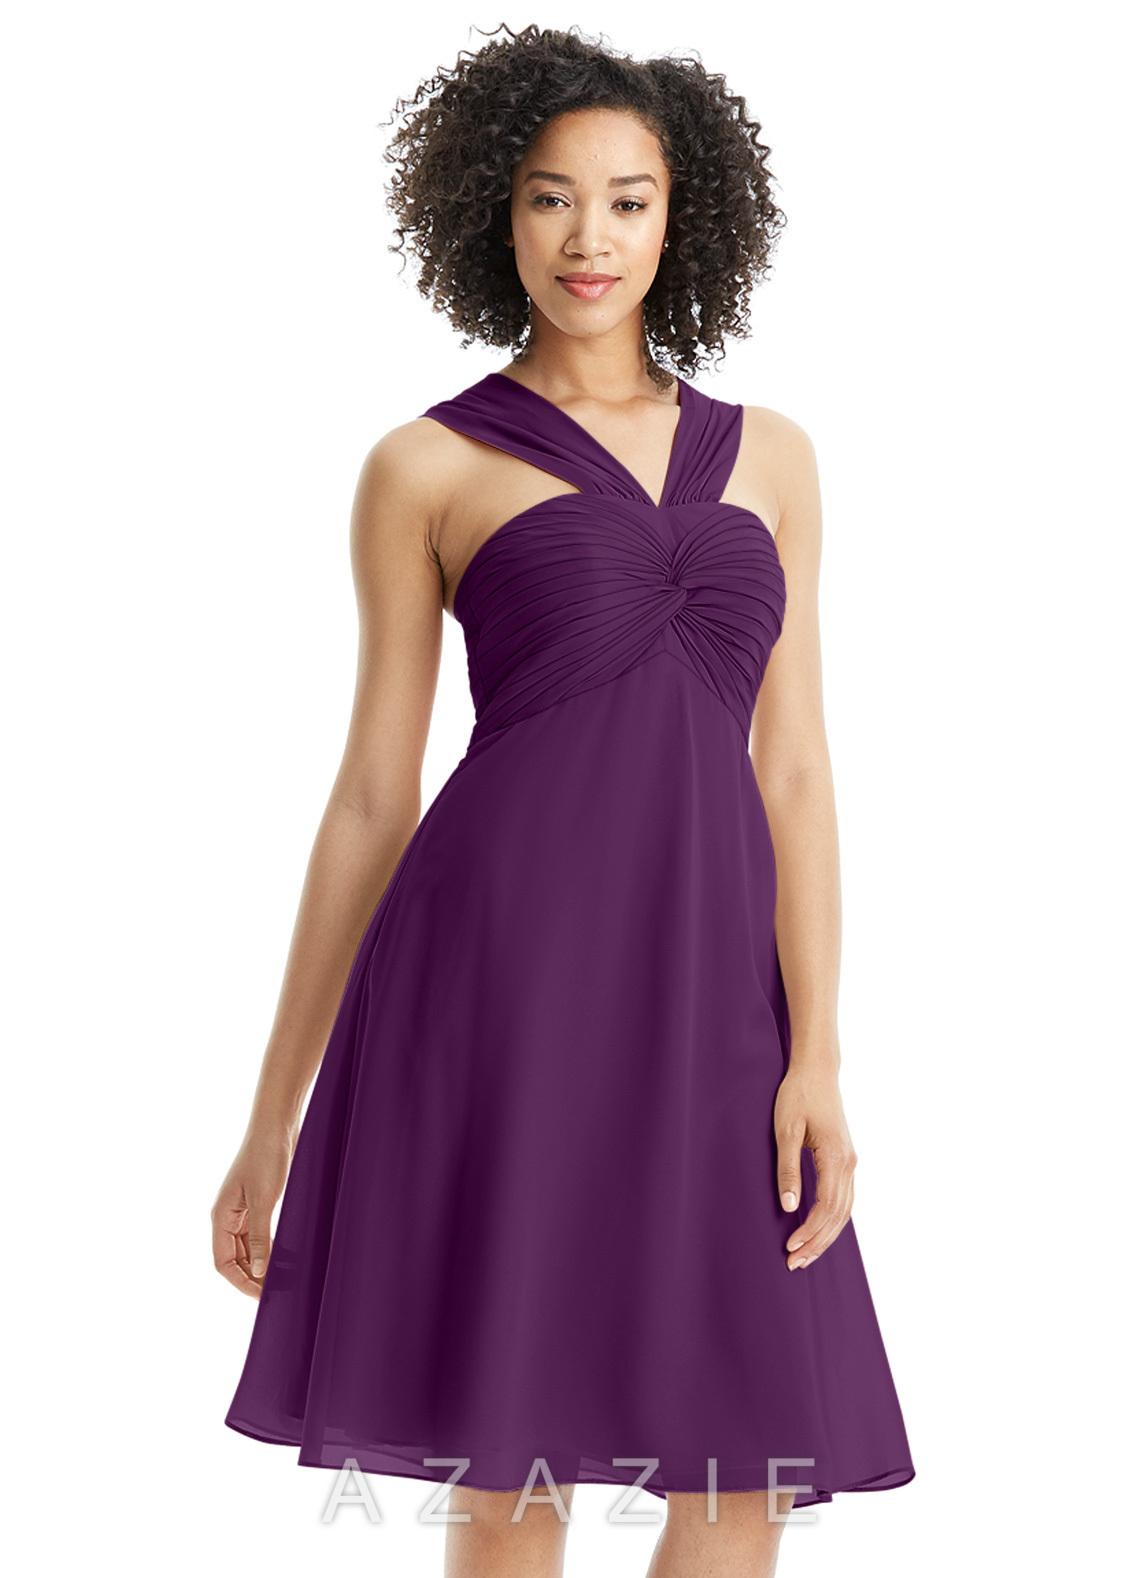 Azazie Mariana Bridesmaid Dress   Azazie